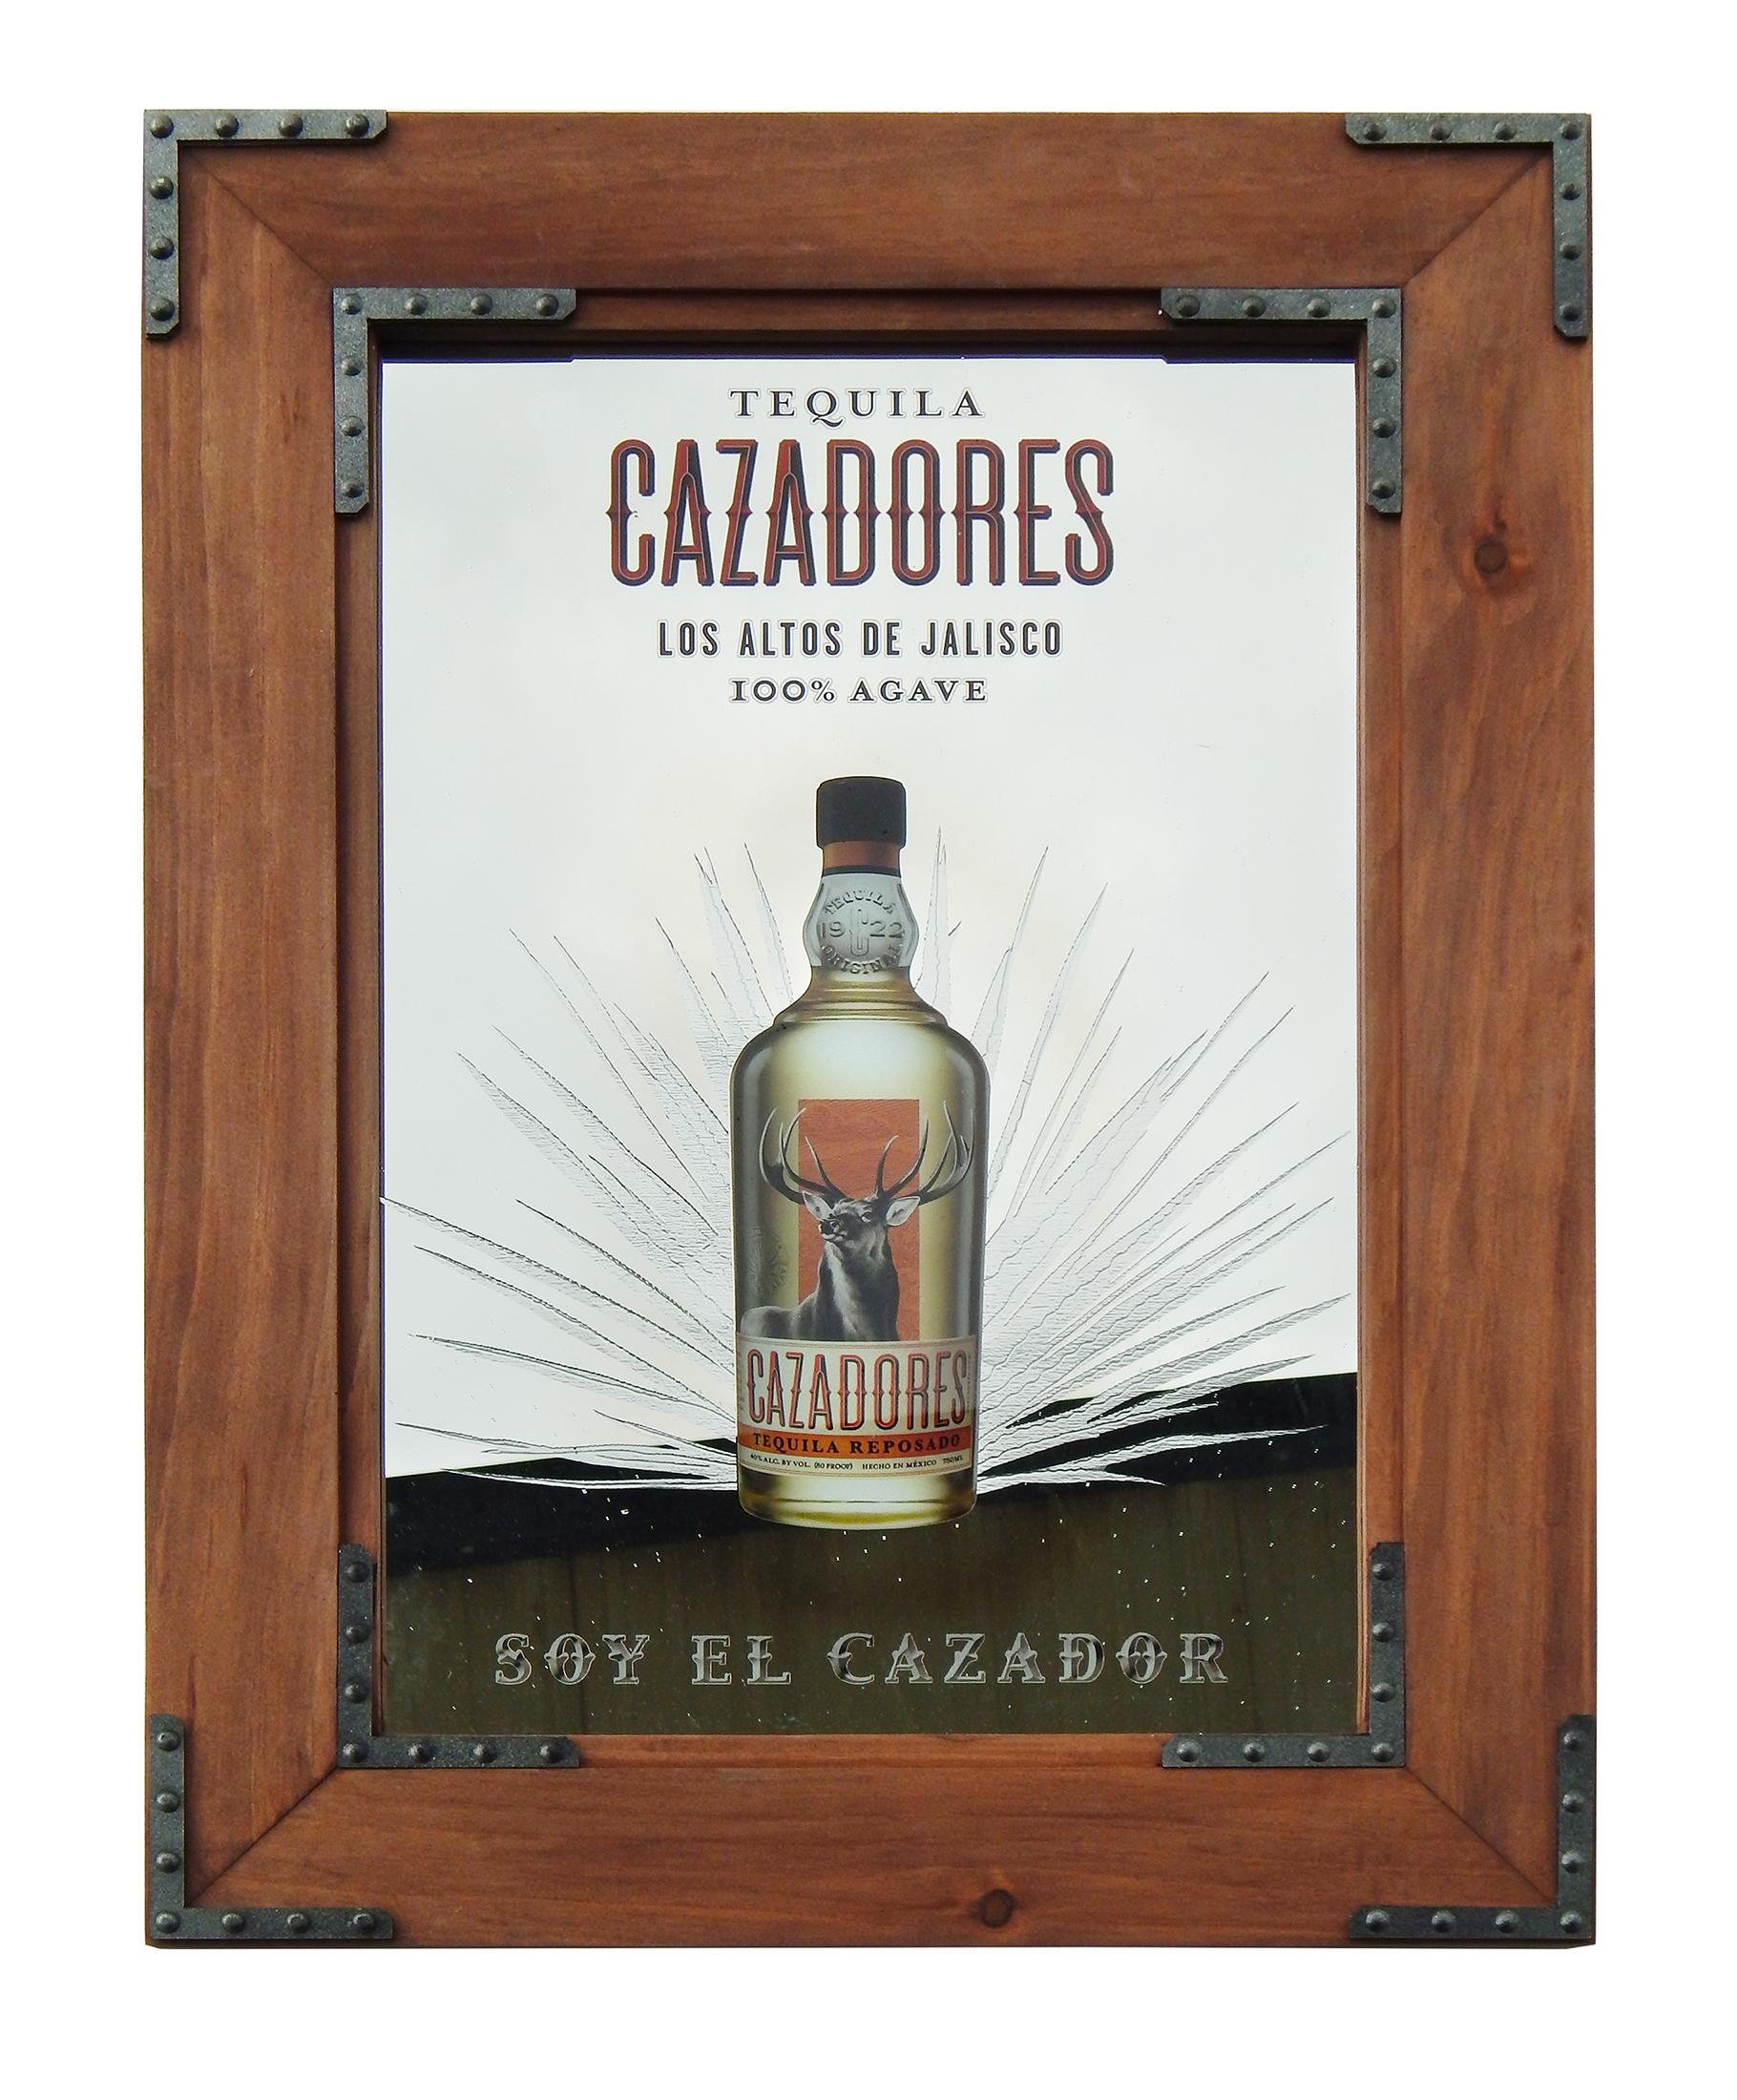 BGP-166 Cazadores Tequila Mirror